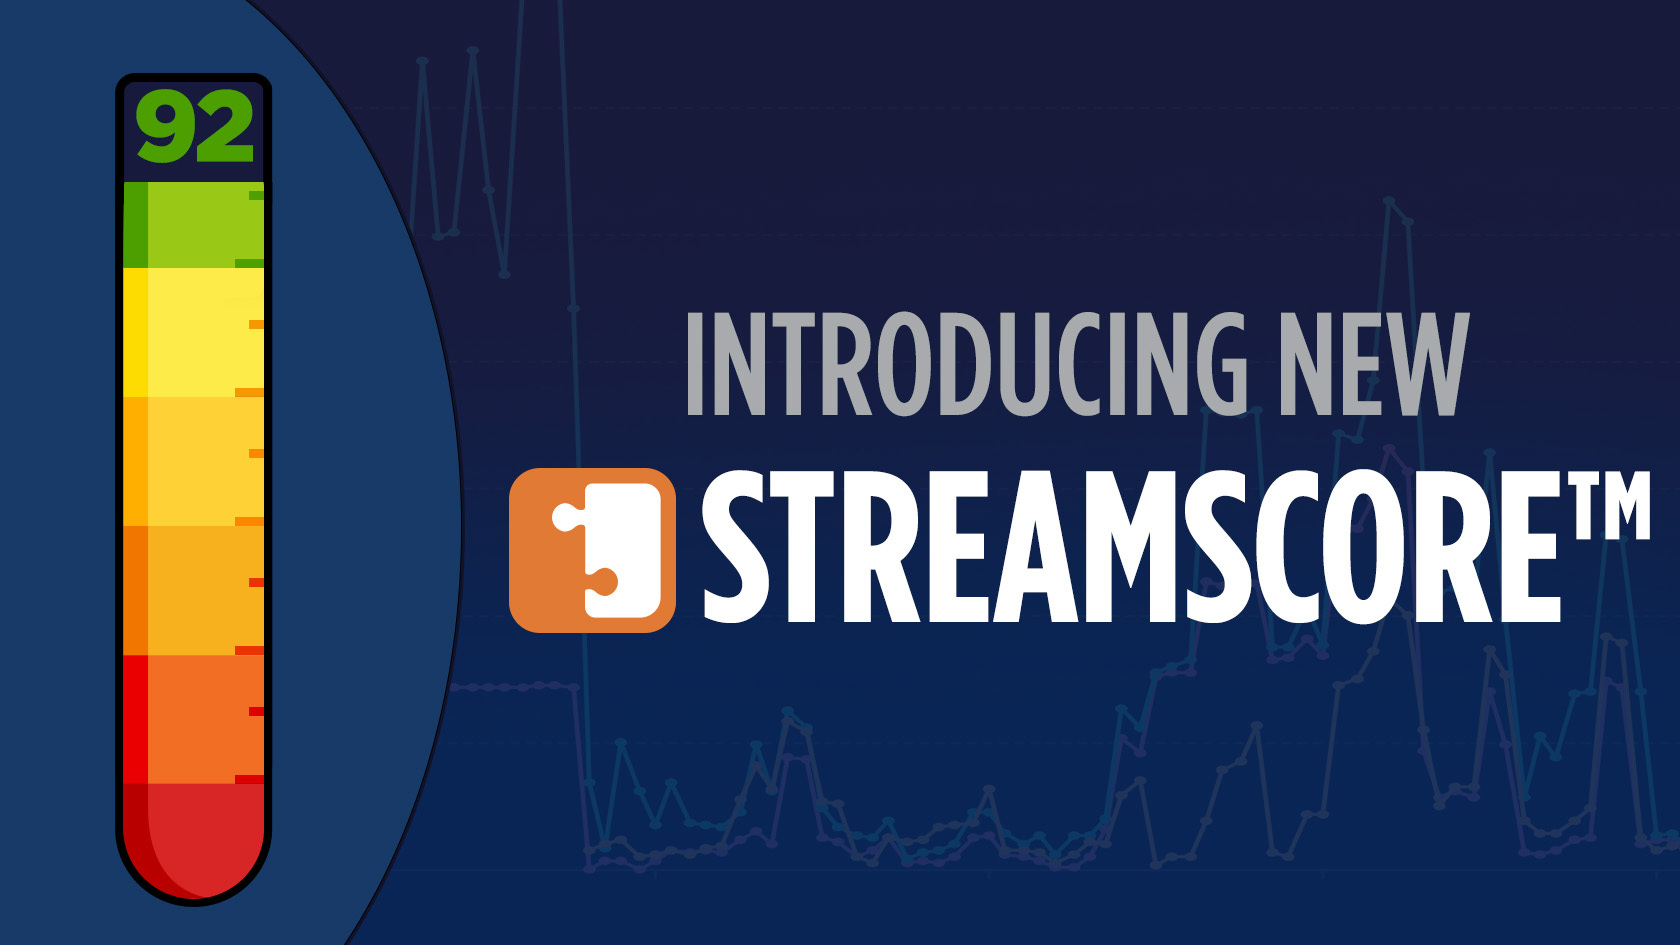 StreamScore Email reputation monitor